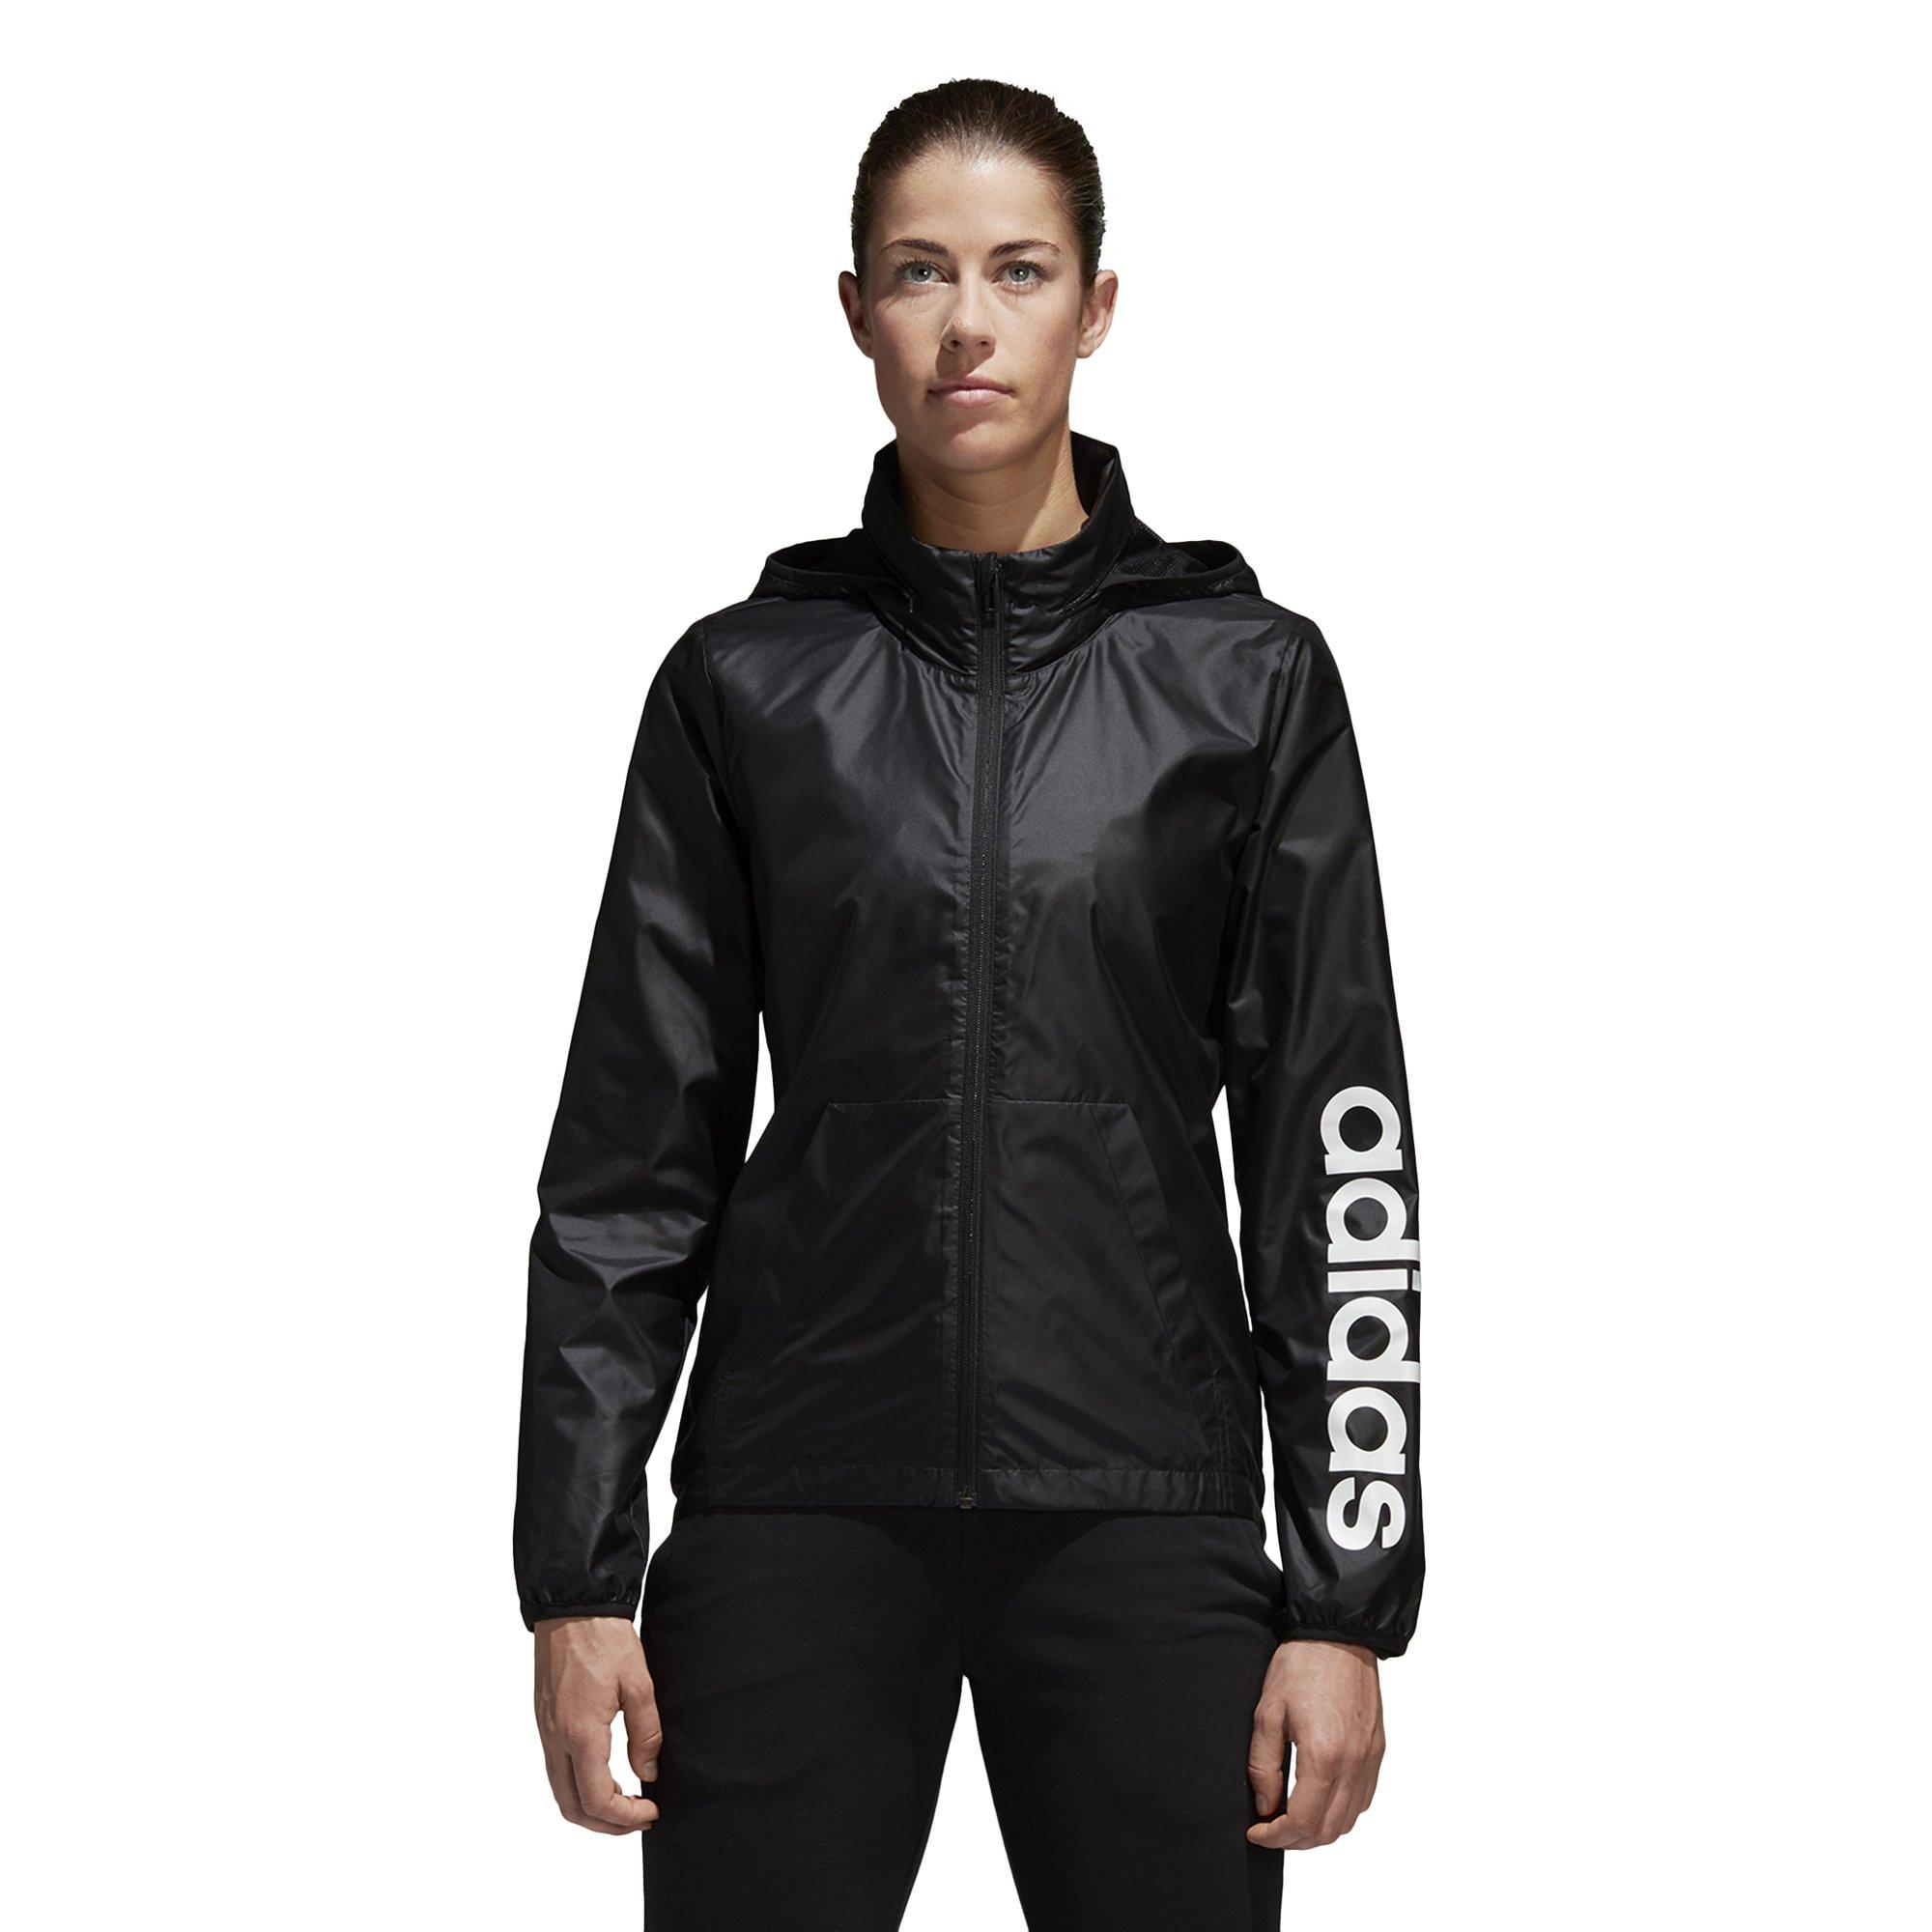 adidas Women's Linear Windbreaker Jacket, Black, Large by adidas (Image #4)